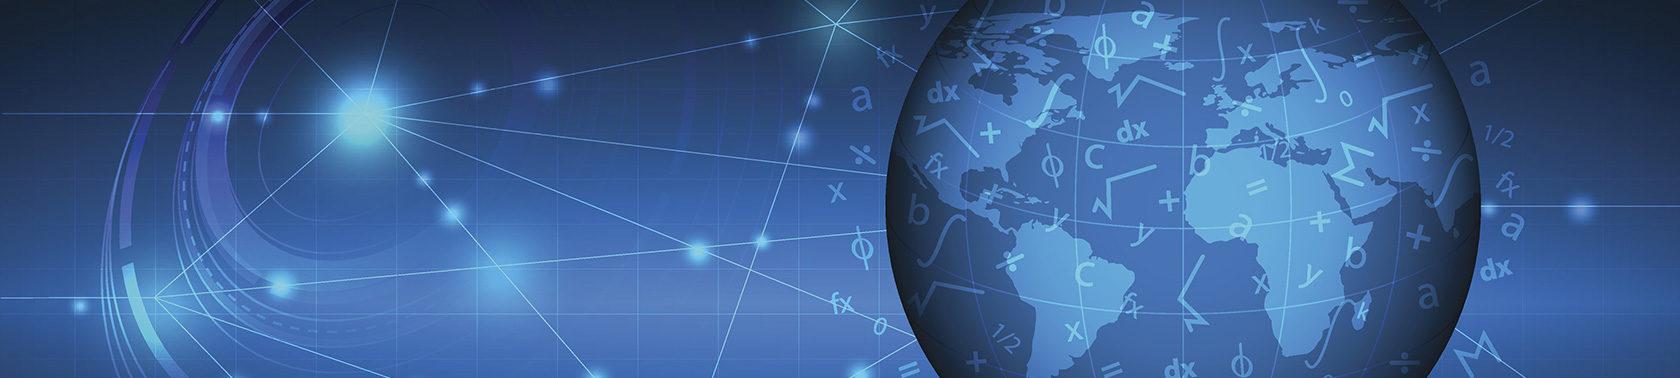 HPC science blog banner